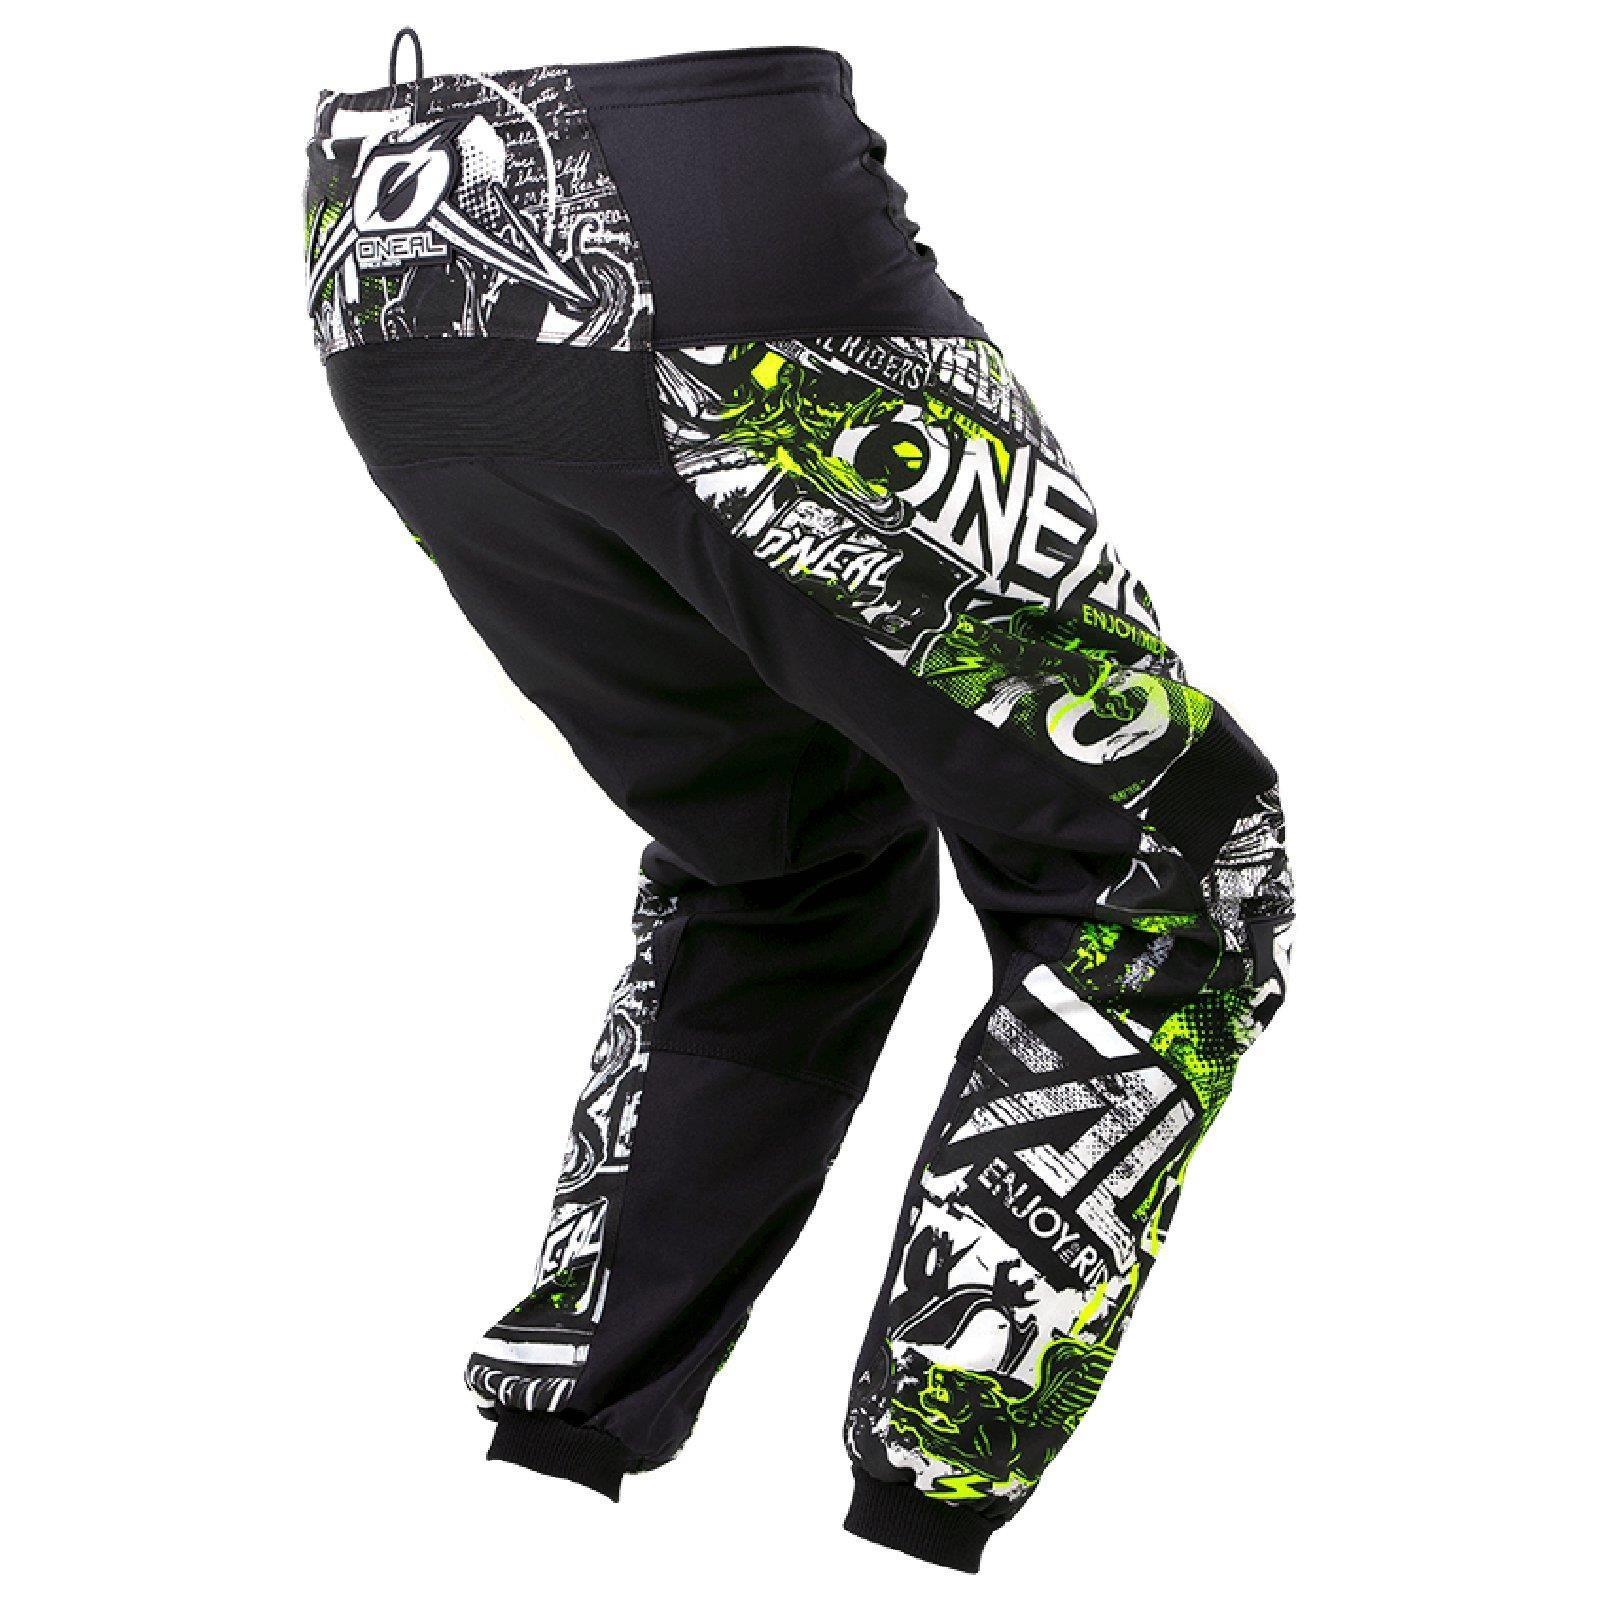 ONeal-pantalones-de-Jersey-de-los-ninos-de-pantalones-cortos-ninos-MX-bicicleta-DH-montana-bicicleta miniatura 103